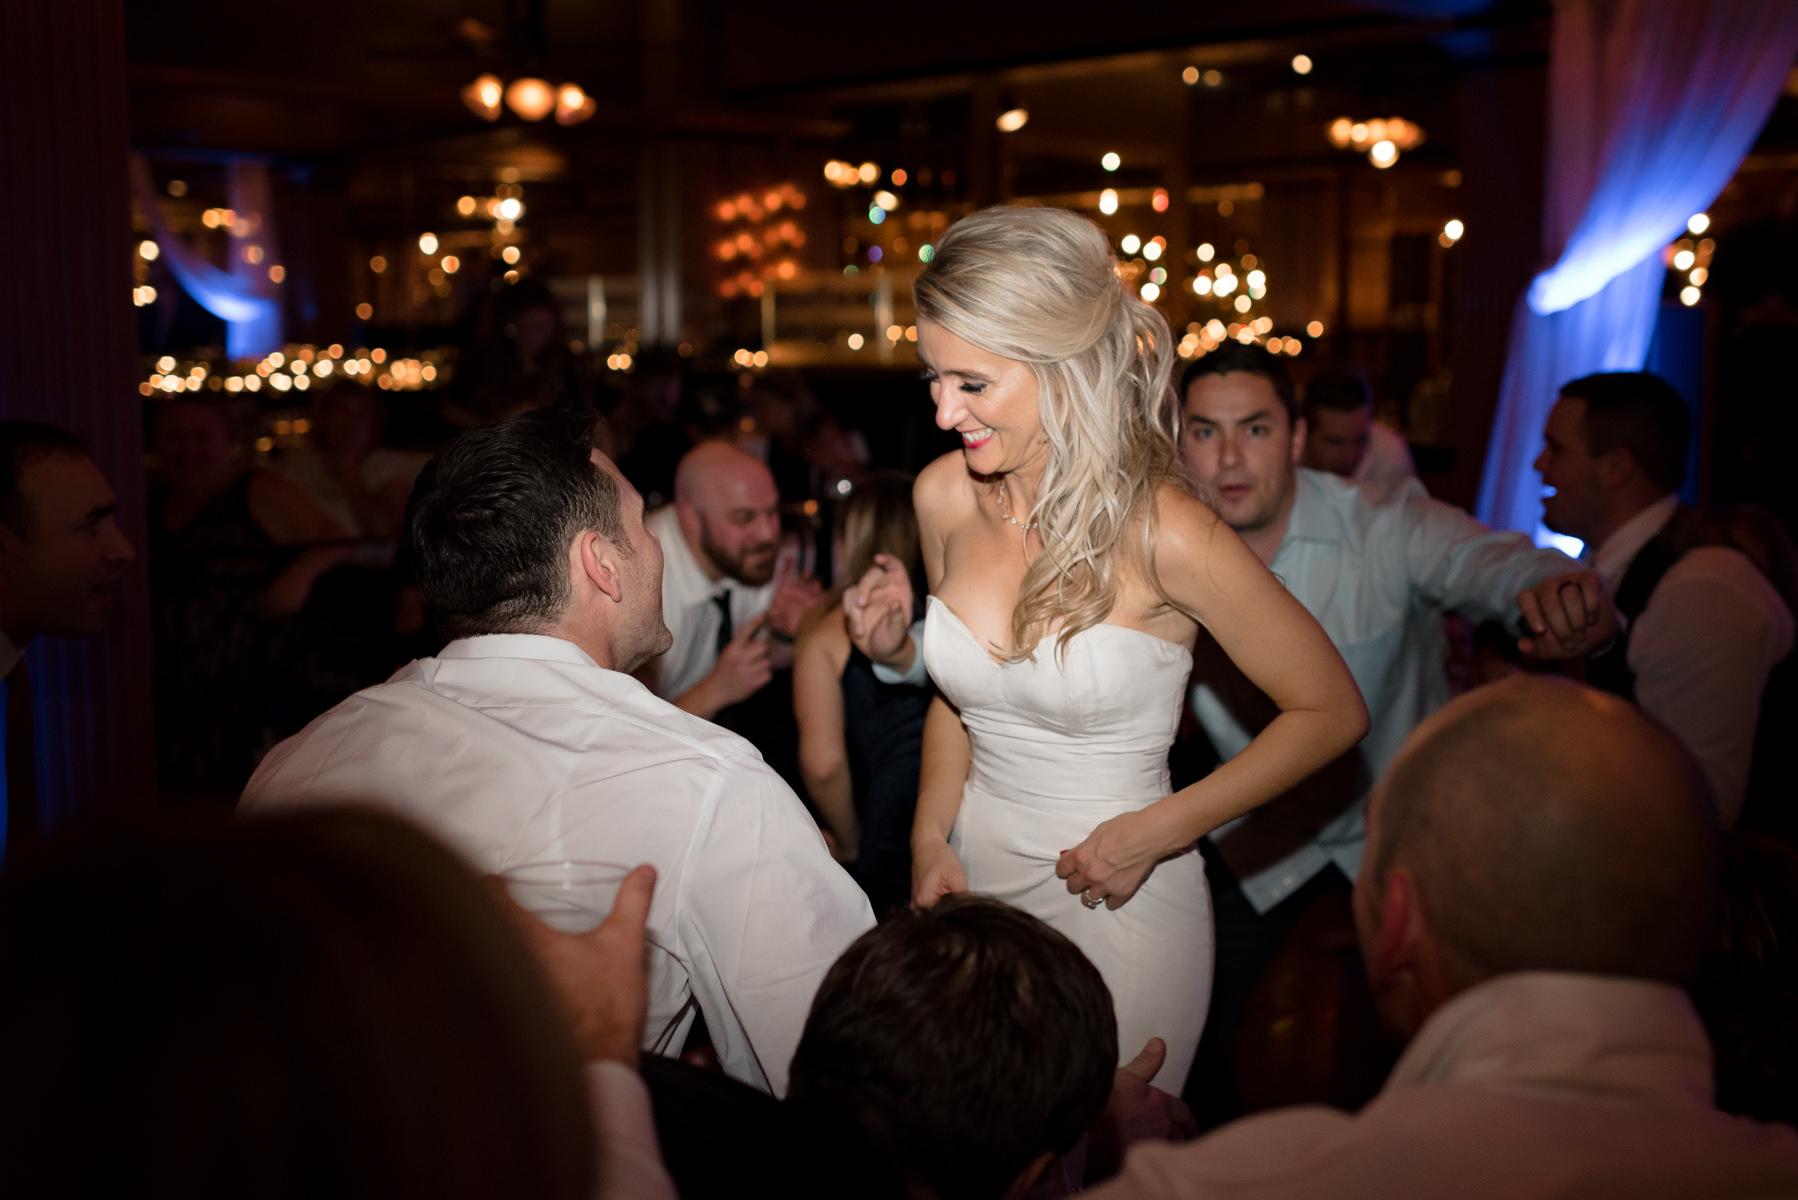 Andrew Tat - Documentary Wedding Photography - Lake Union Cafe - Seattle, Washington -Rachel and Ryan - 64.jpg